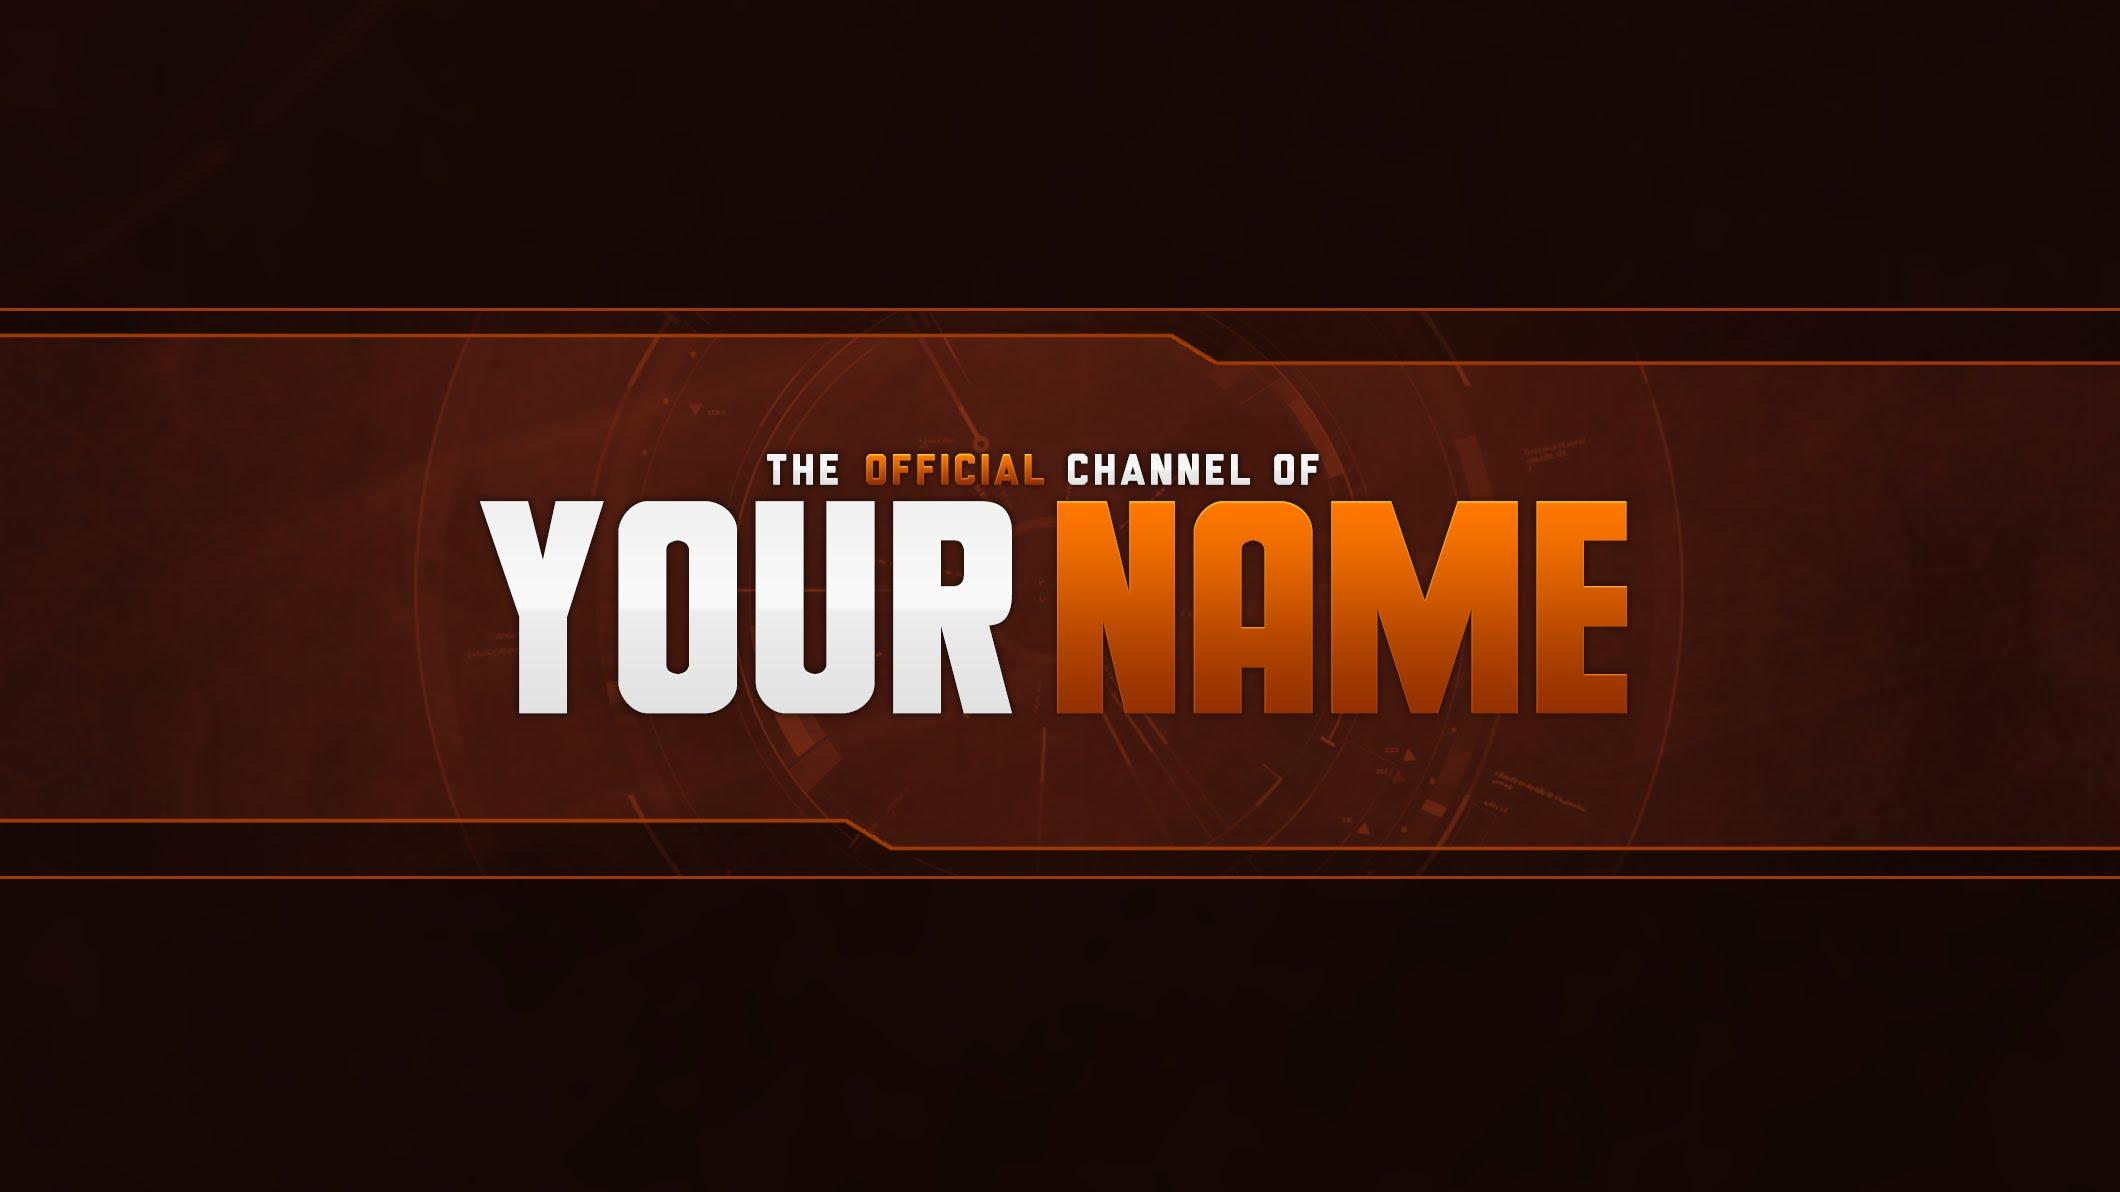 Lovely Youtube Banner Template 2014 Images - Entry Level Resume ...